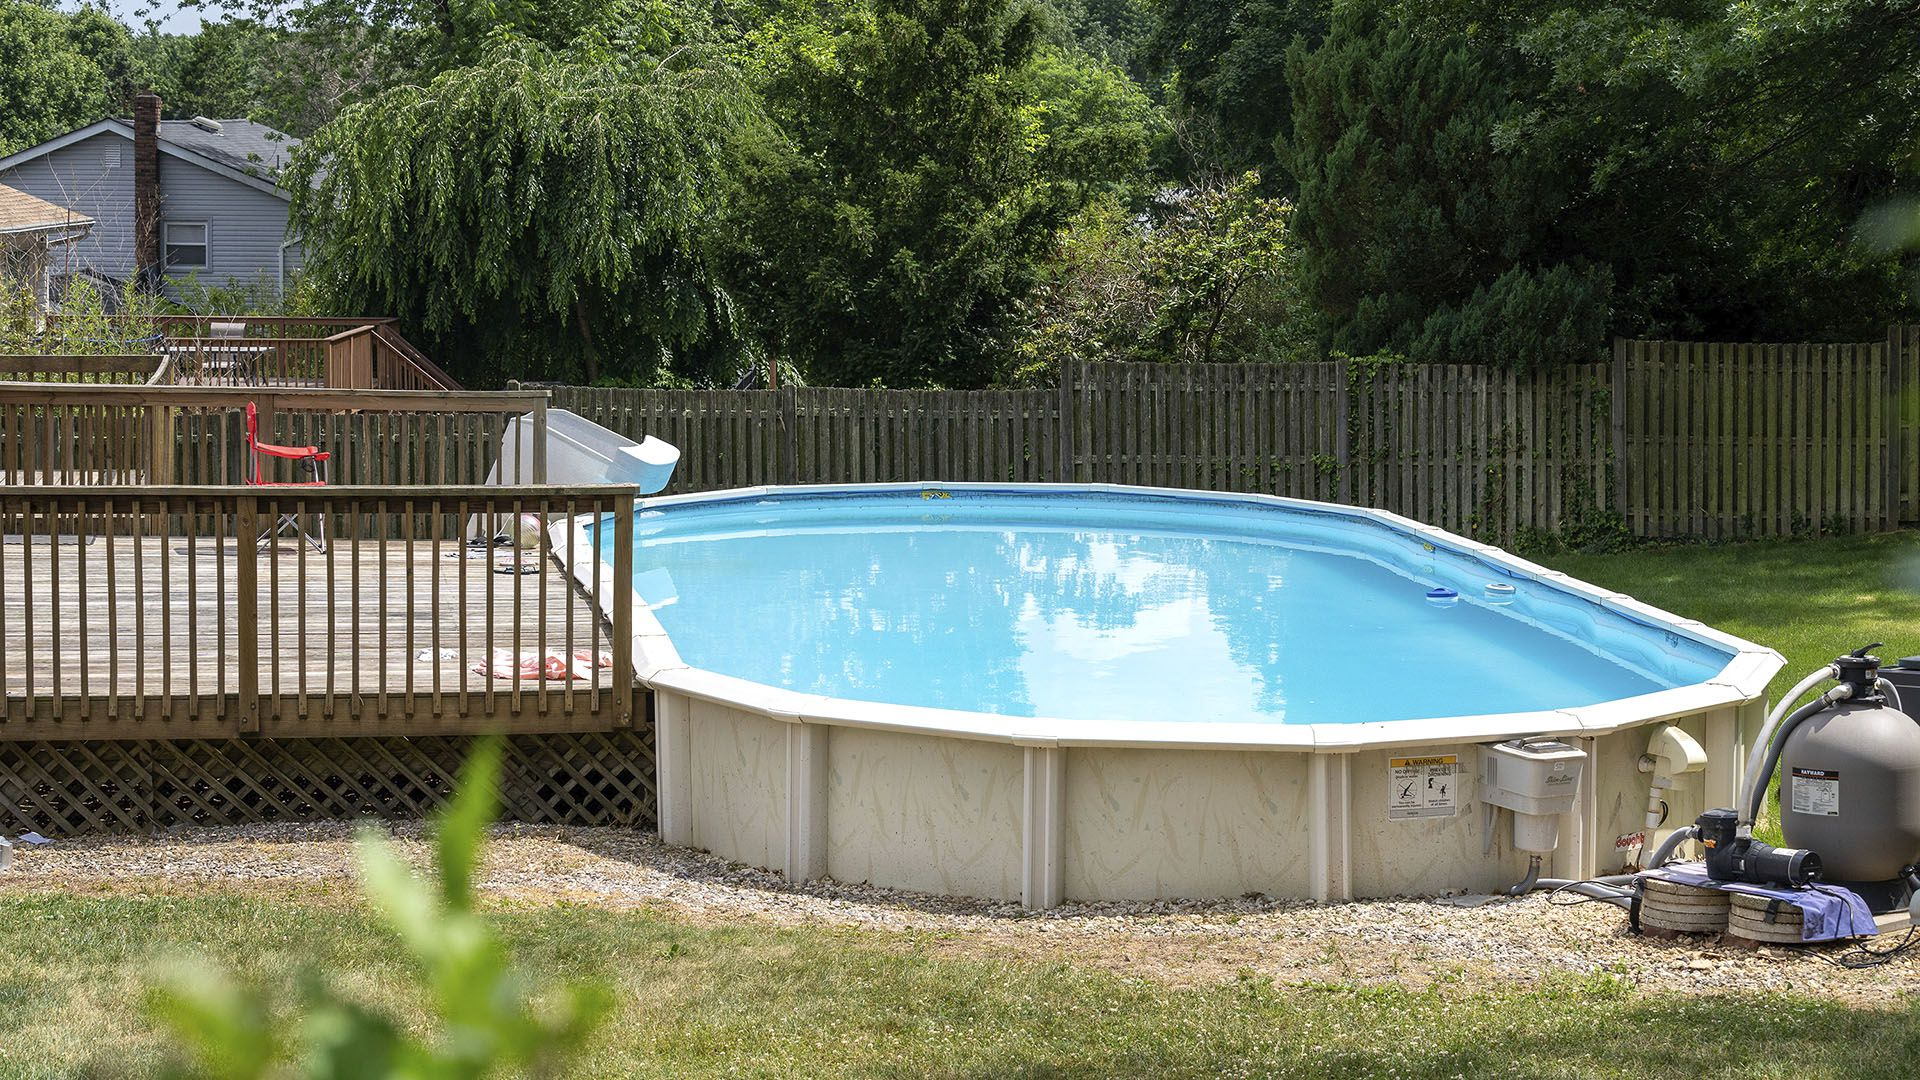 Familia ahogada piscina EEUU